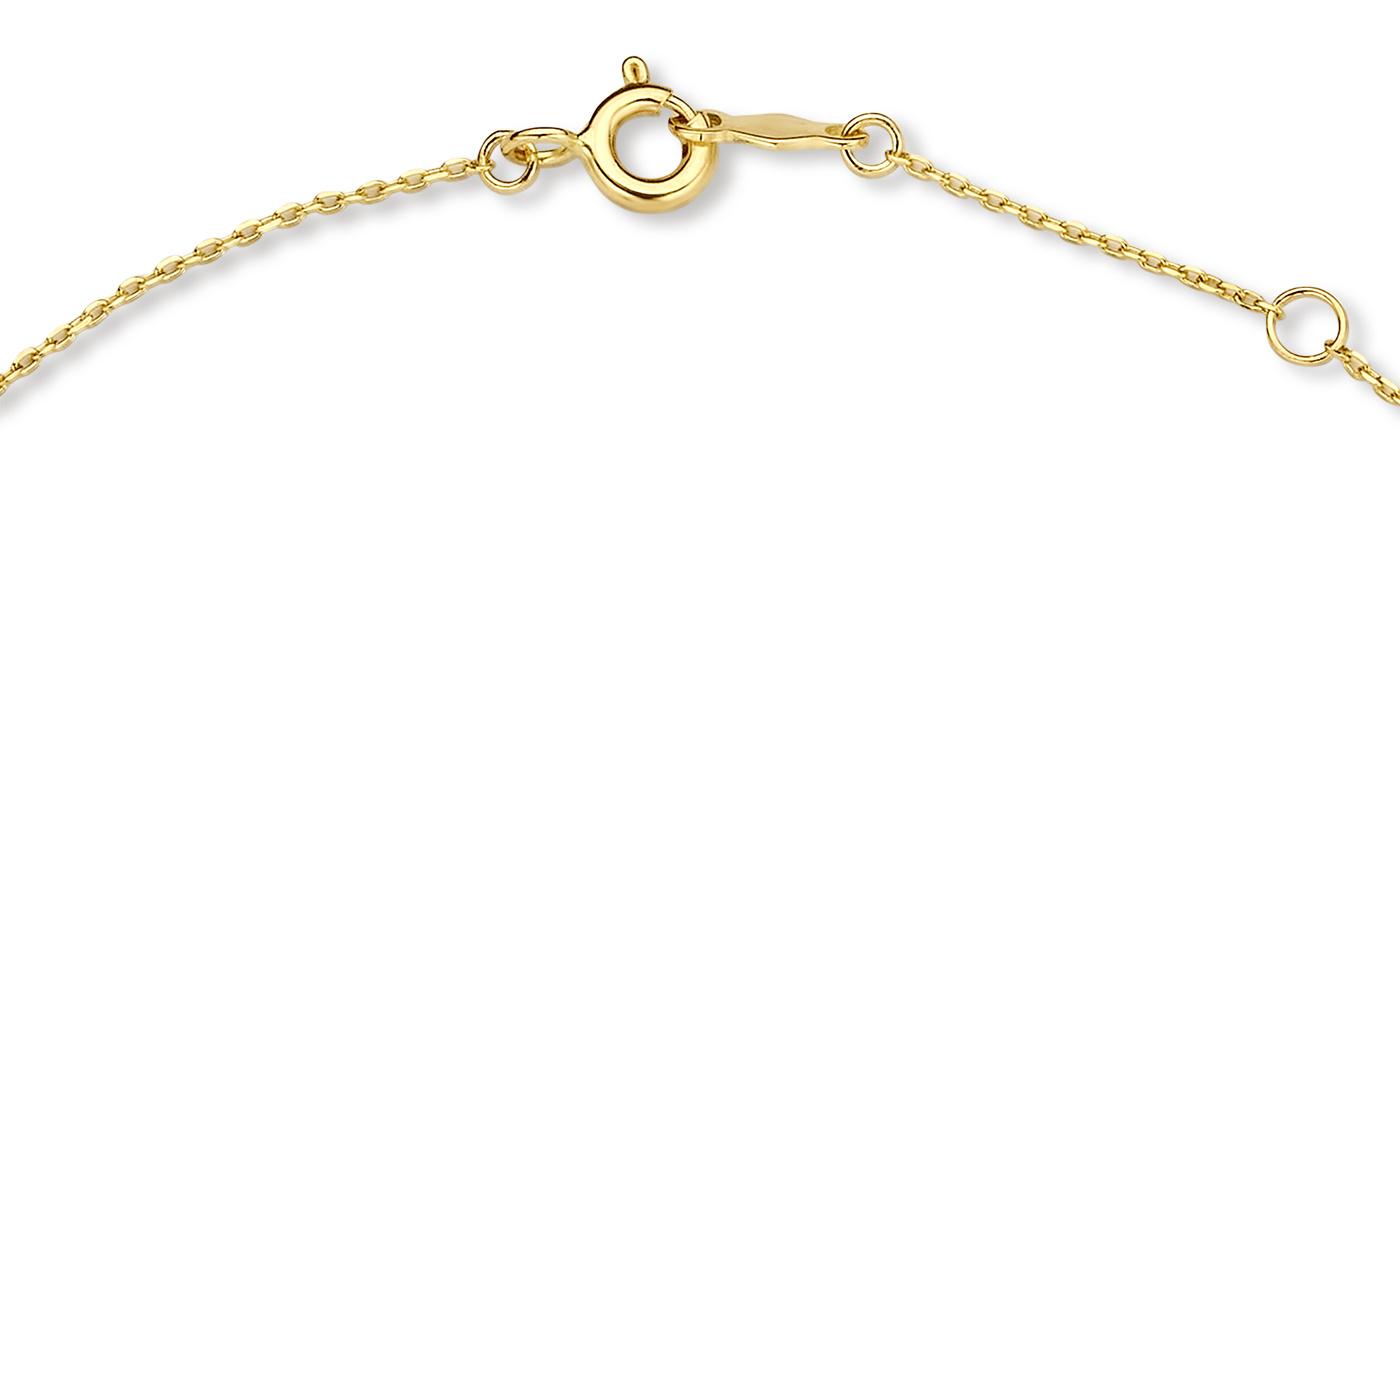 Isabel Bernard Le Marais Eloise collier en or 14 carats